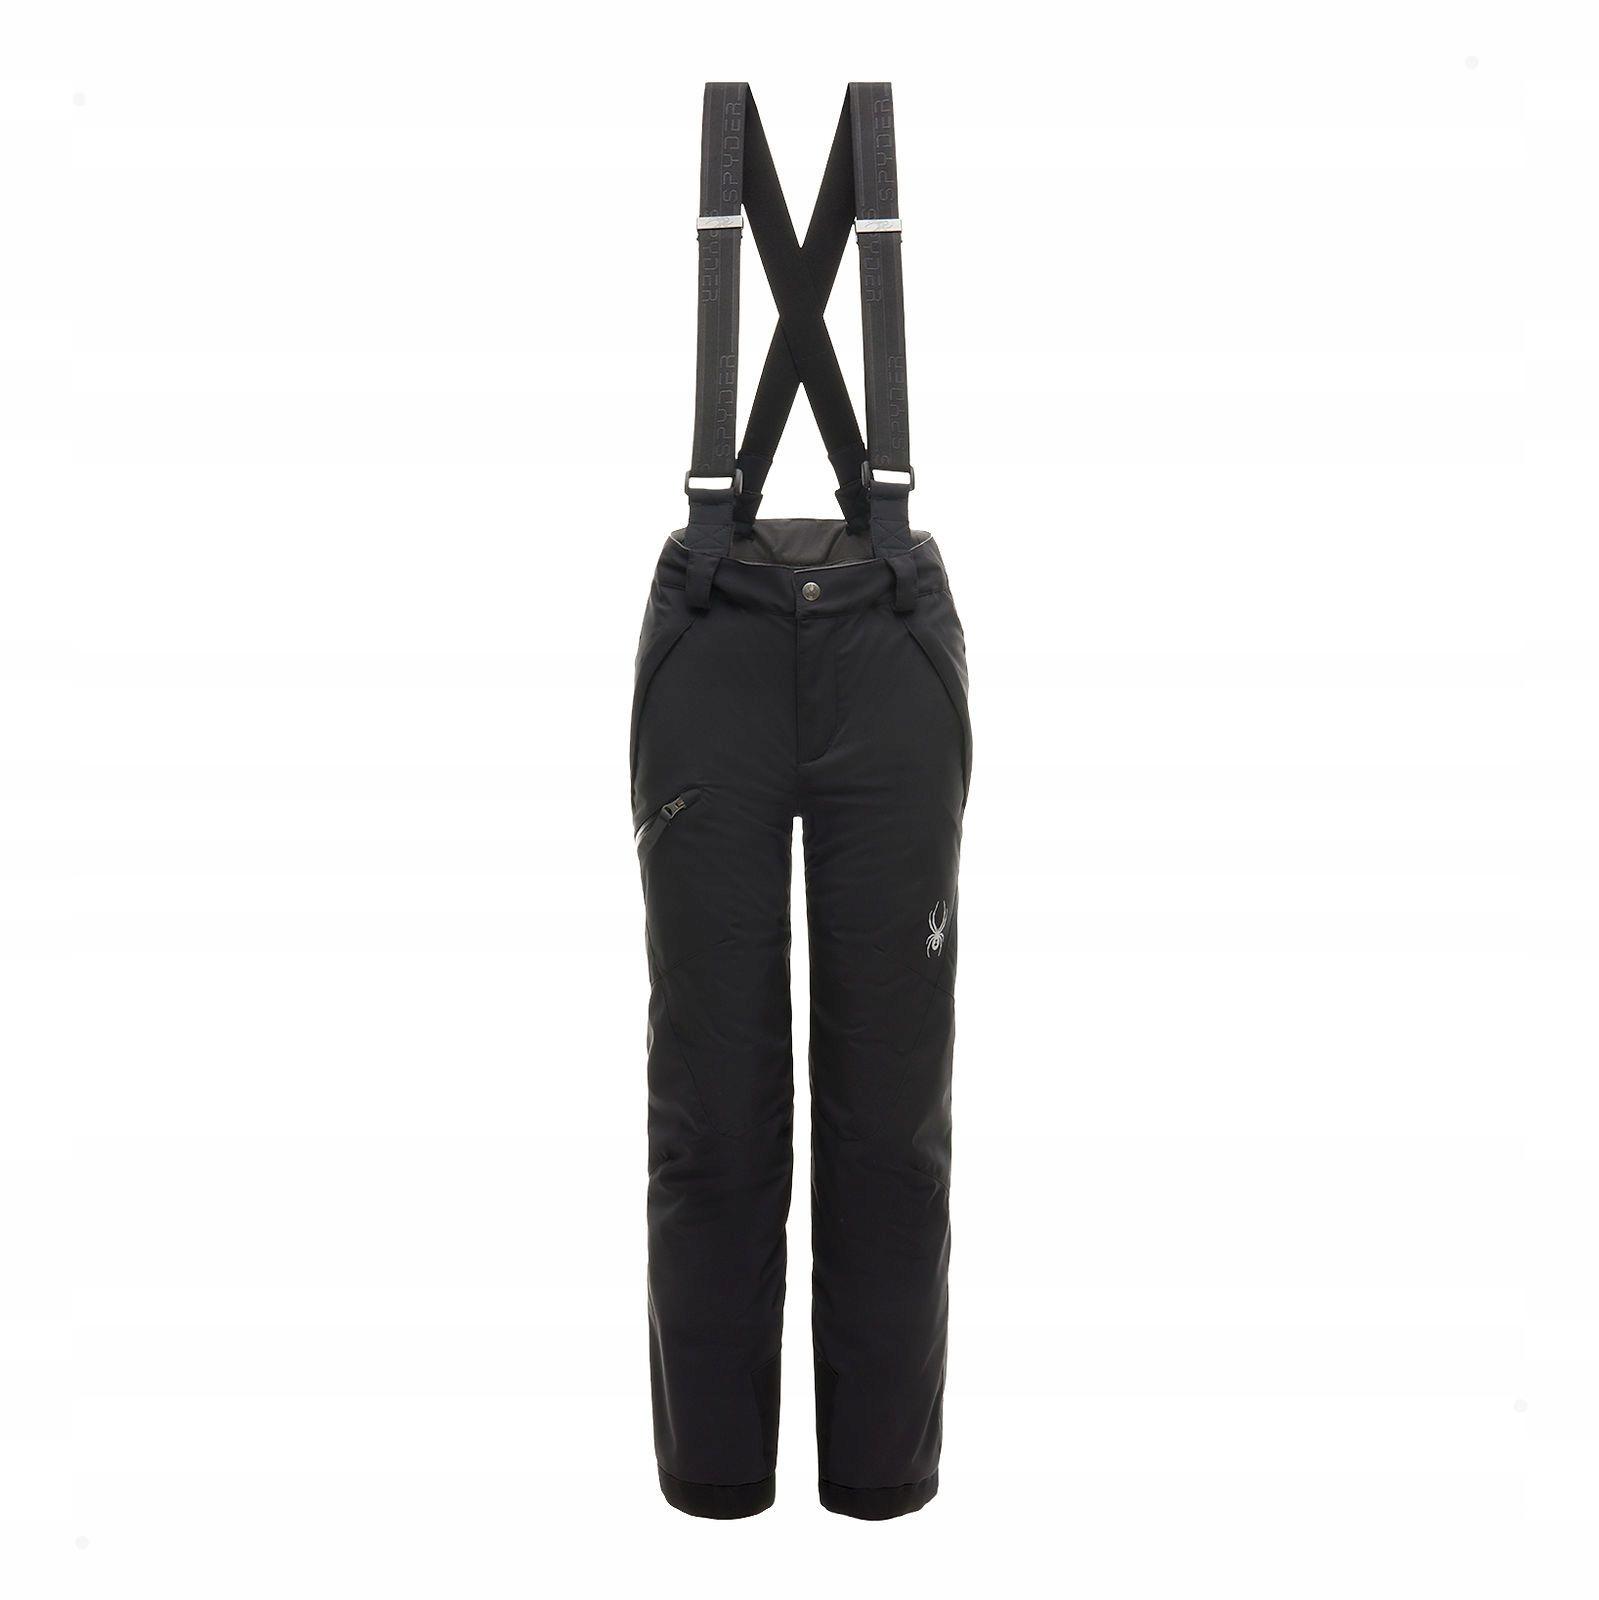 Spodnie narciarskie Spyder Propulsion 8lat